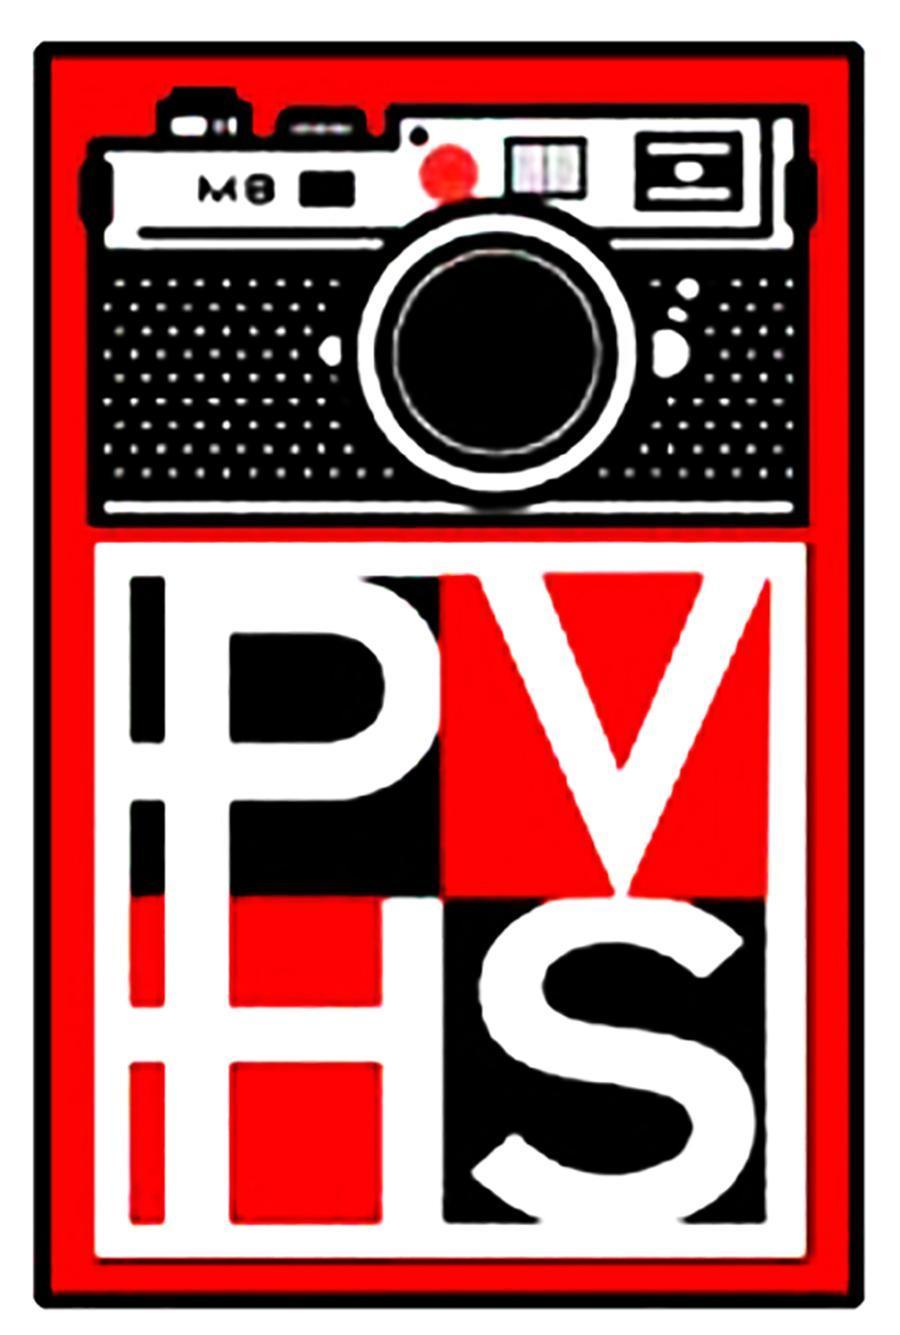 PVHS logo